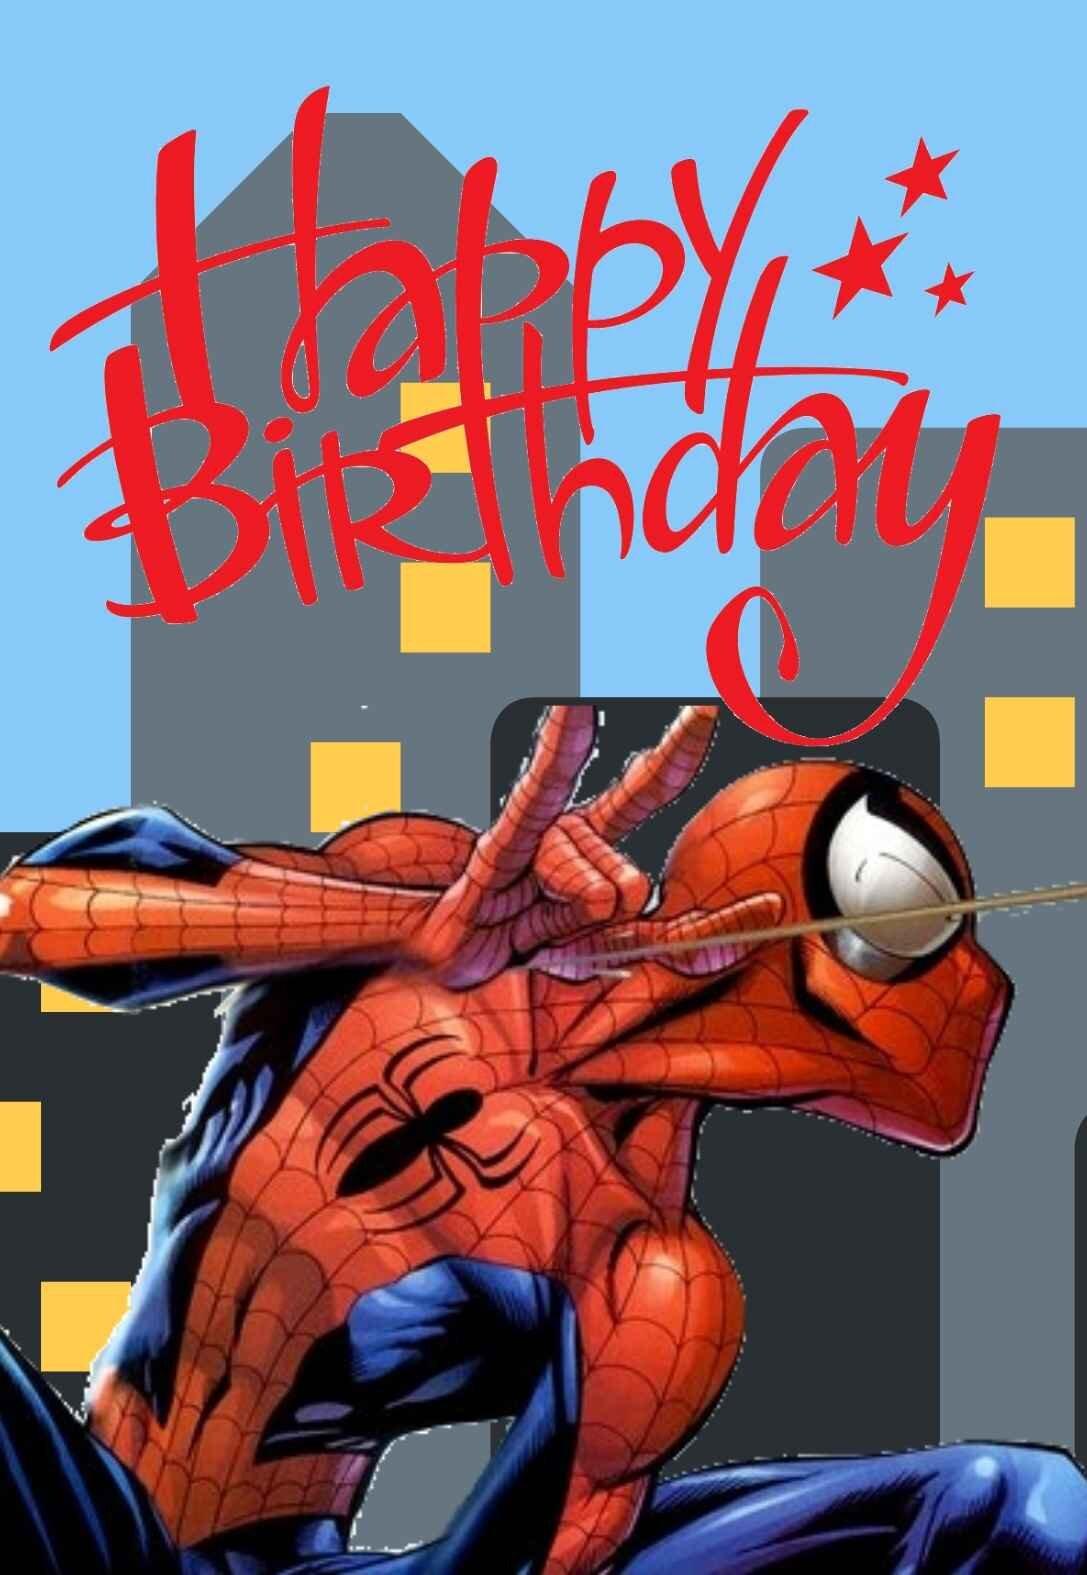 Spiderman Birthday Card : spiderman, birthday, Spiderman, Printable, Birthday, Cards, PRINTBIRTHDAY.CARDS